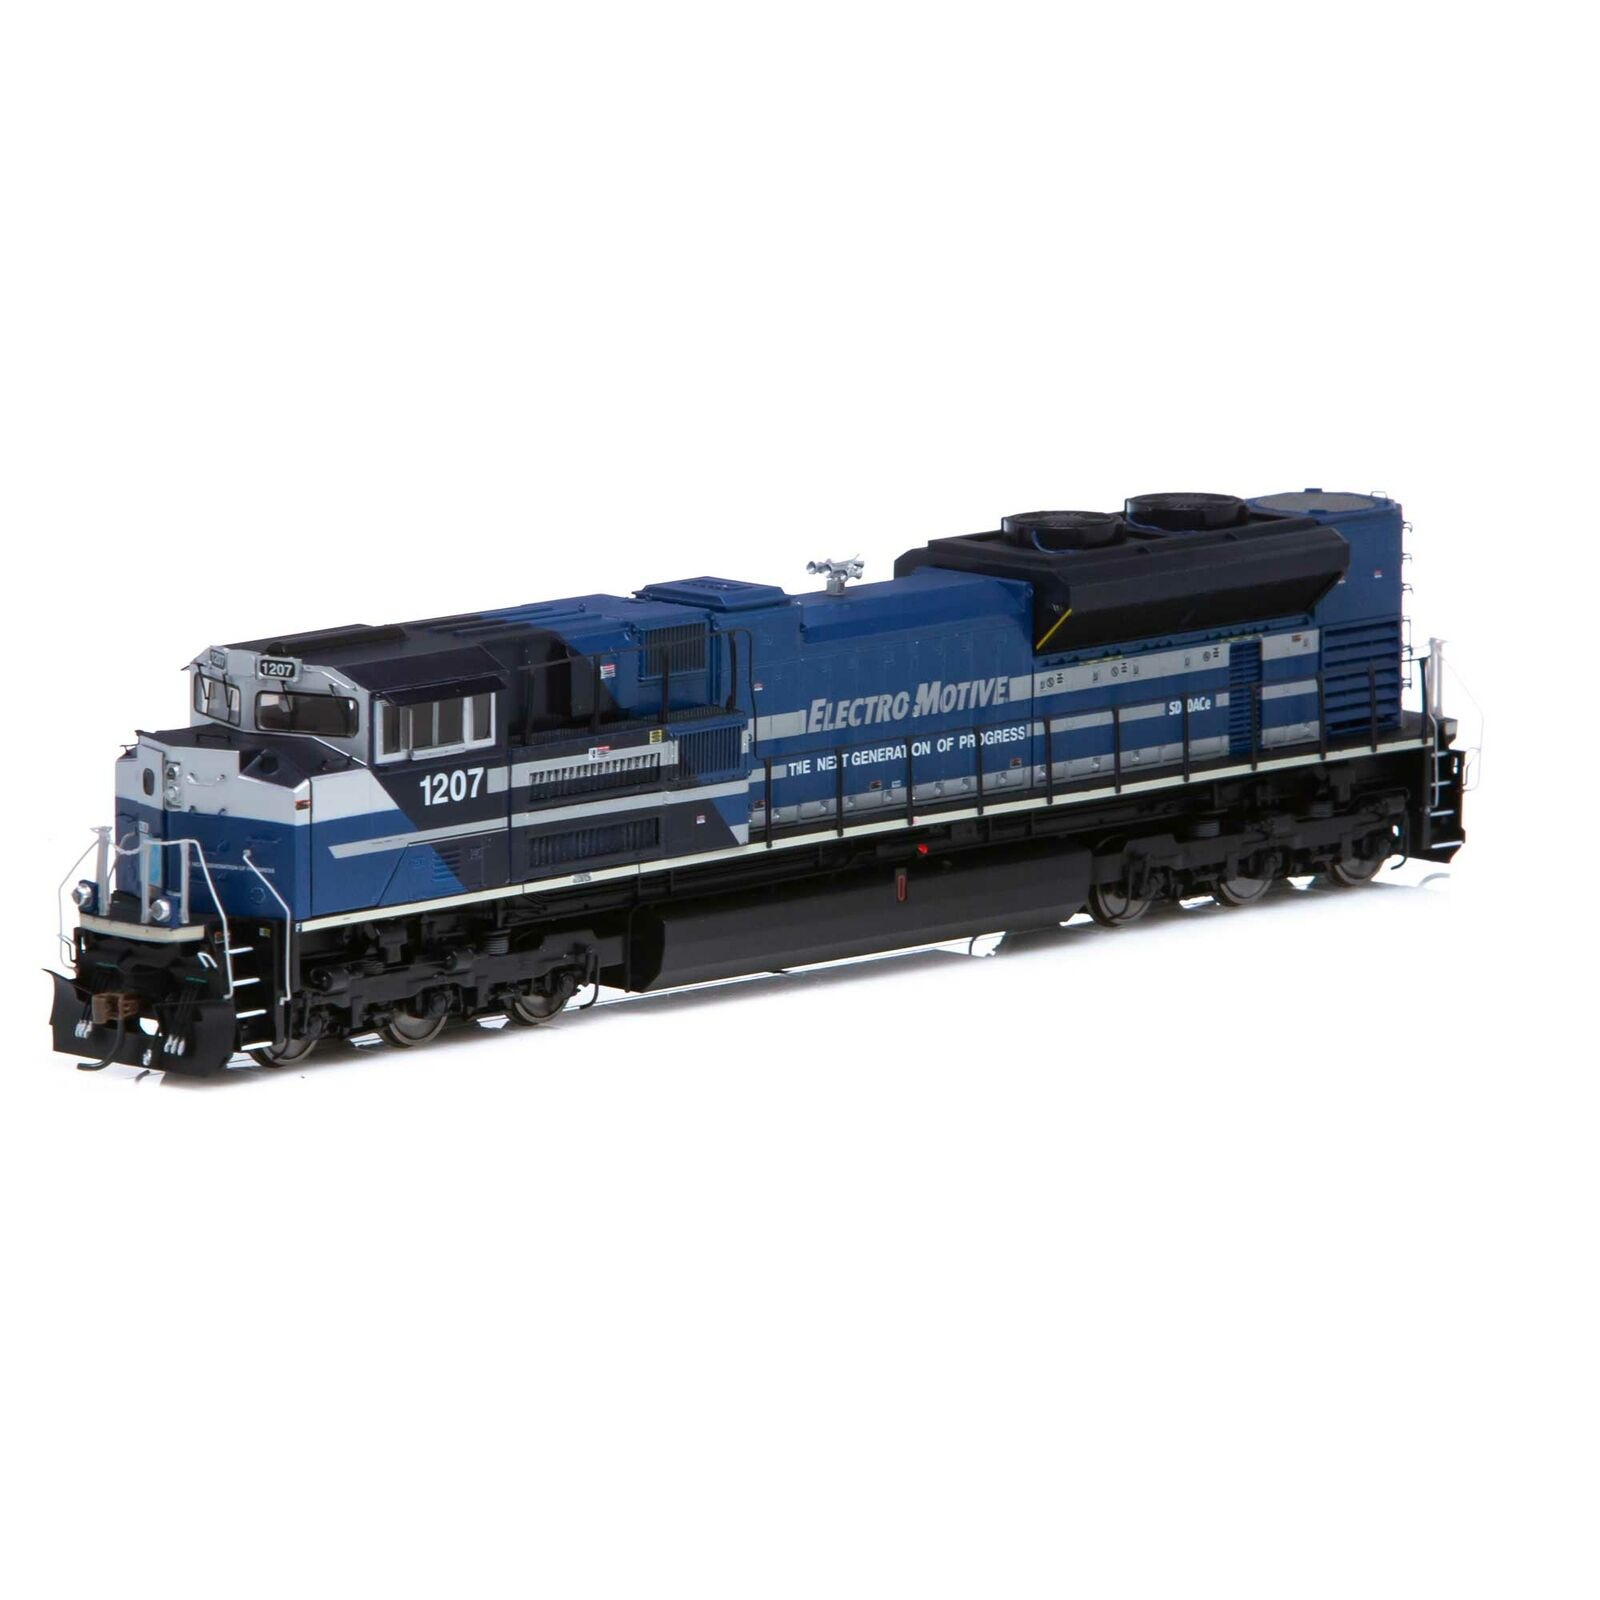 Athearrn ATHG89837 SD70ACe wDCC & suono EMD Lease  1207 Train HO Scale